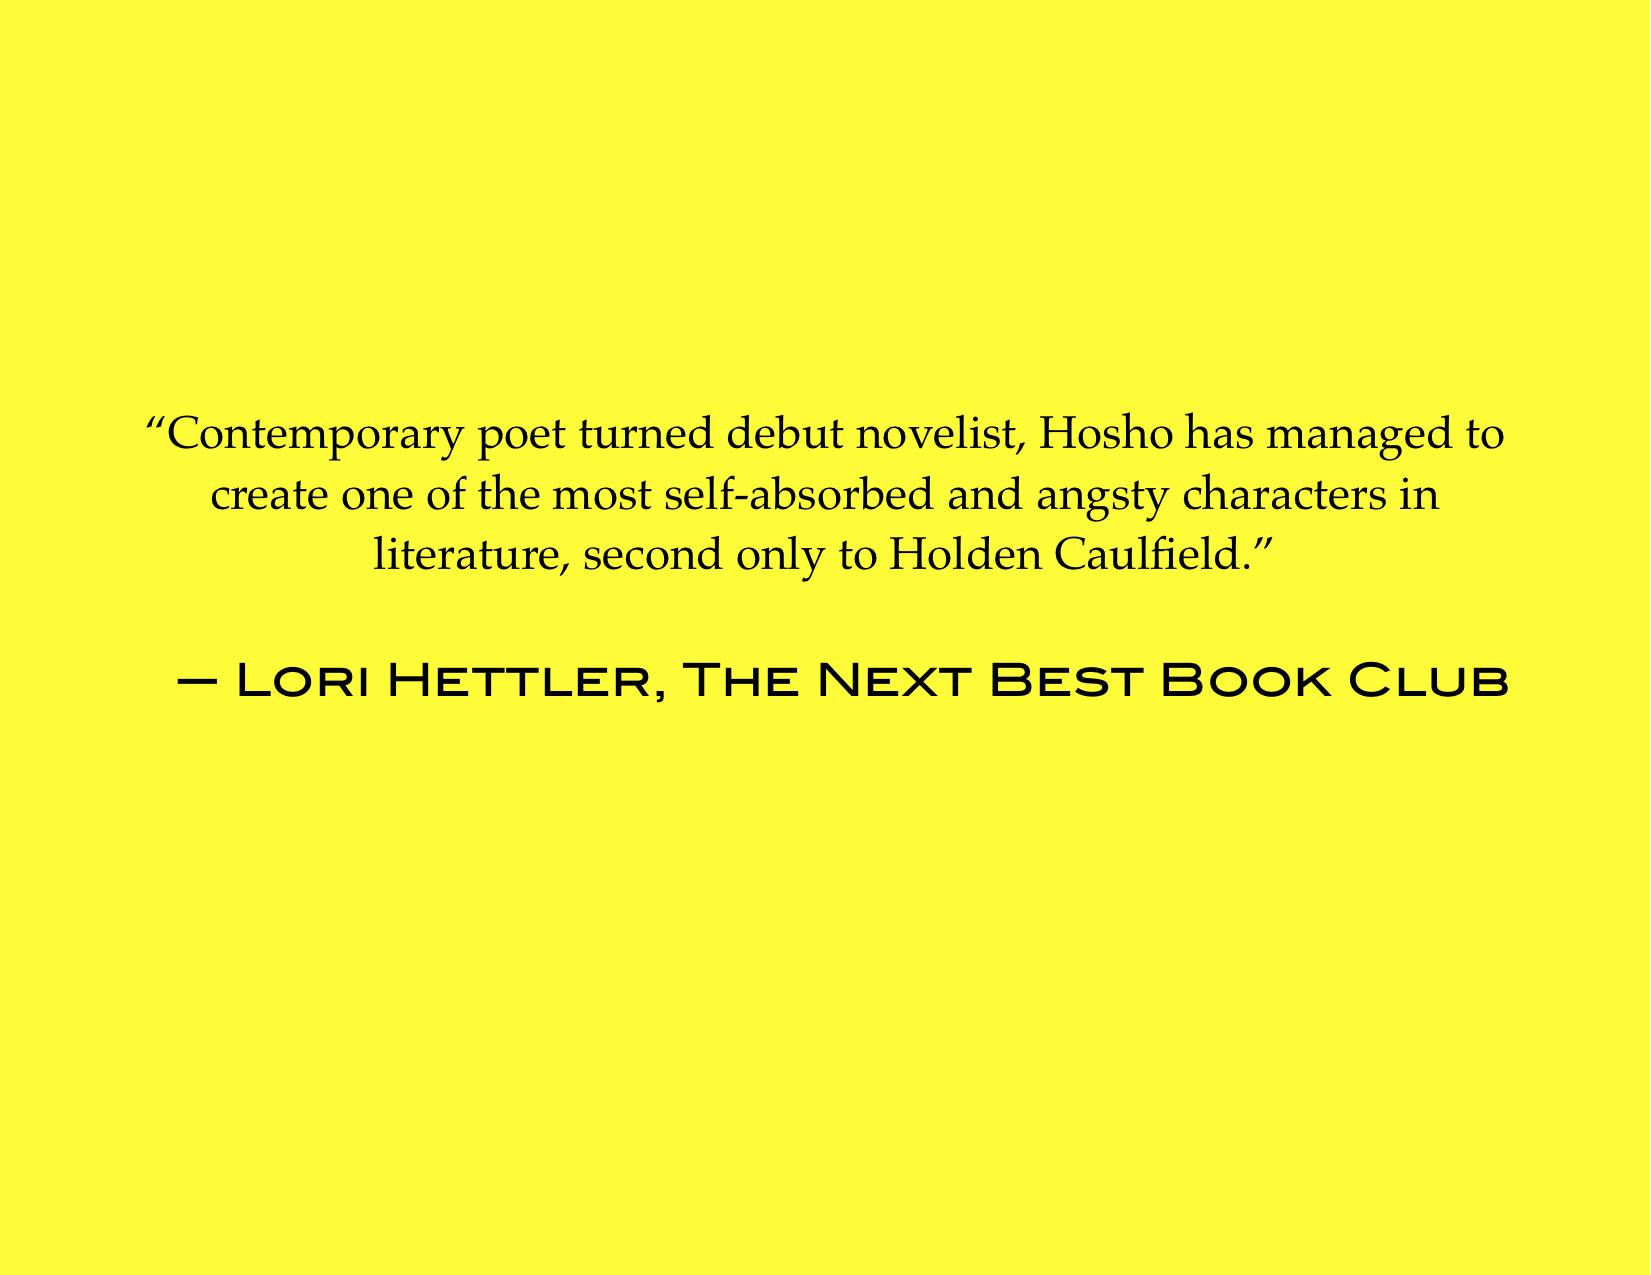 3 Lori Hettler Blurb.png